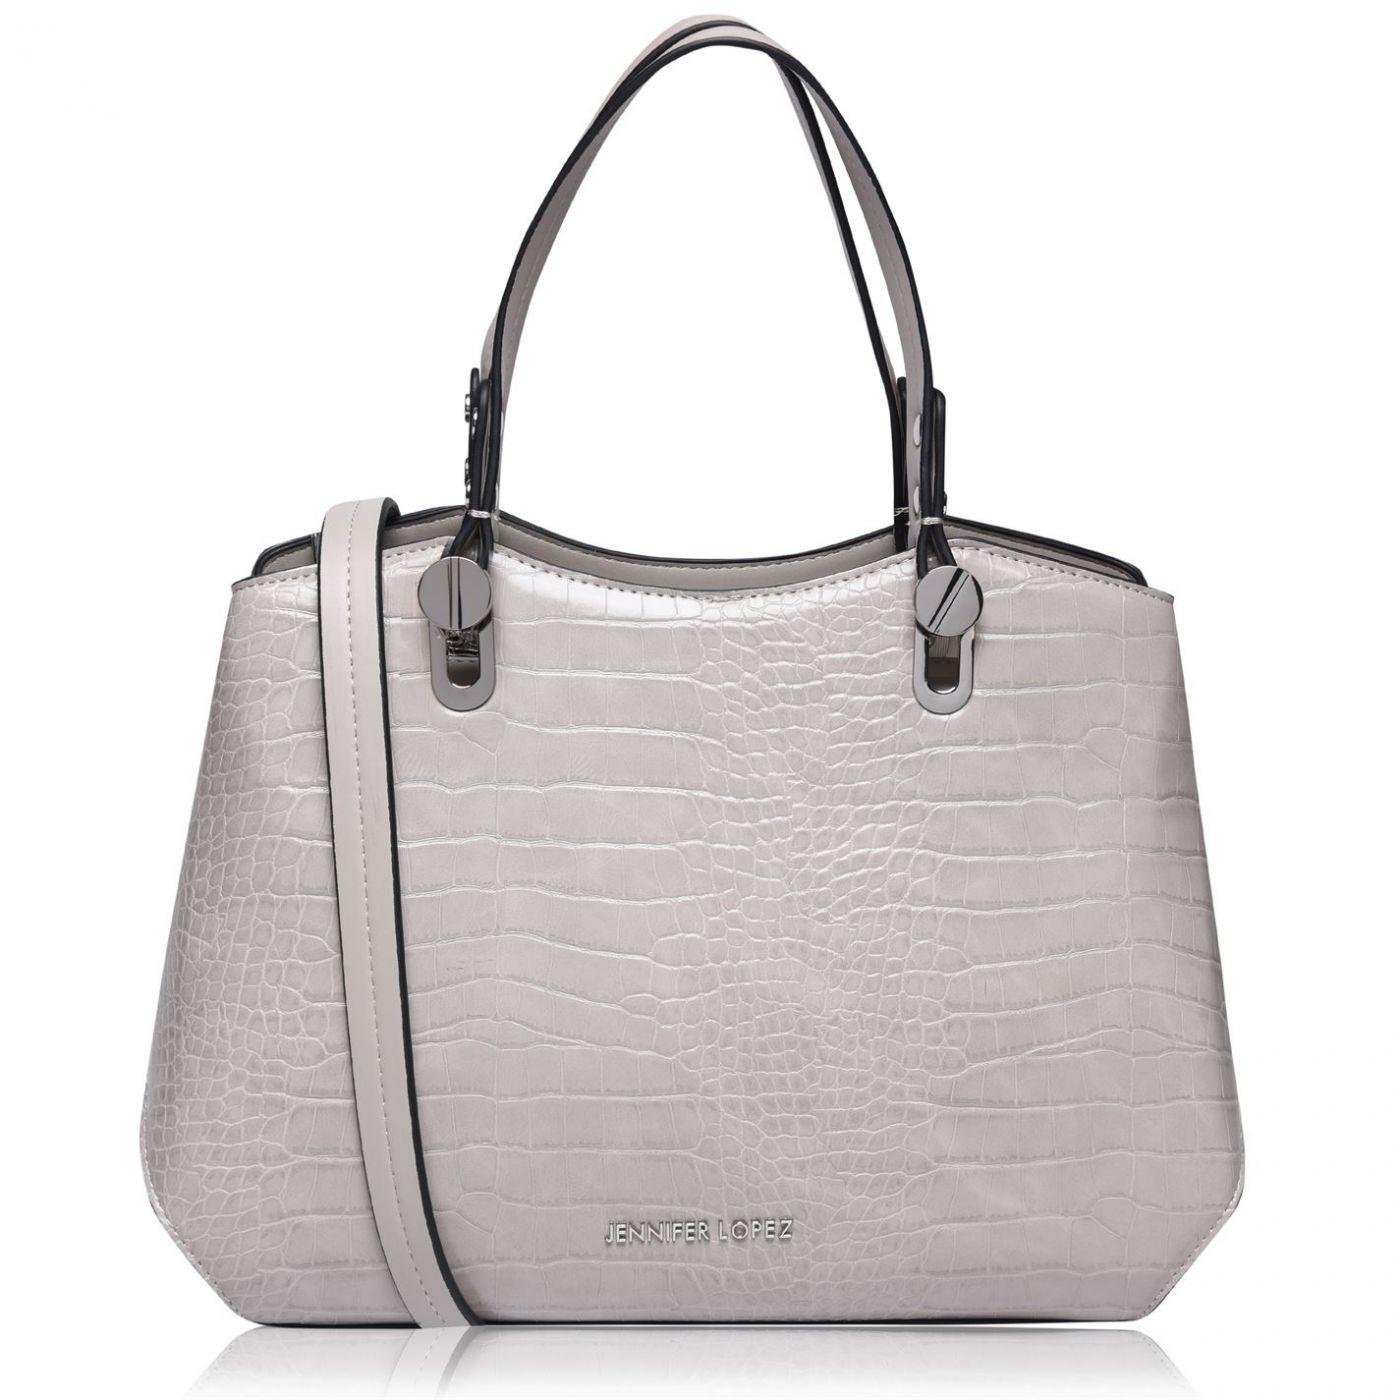 Jennifer Lopez Rylee Bag 02 BX99